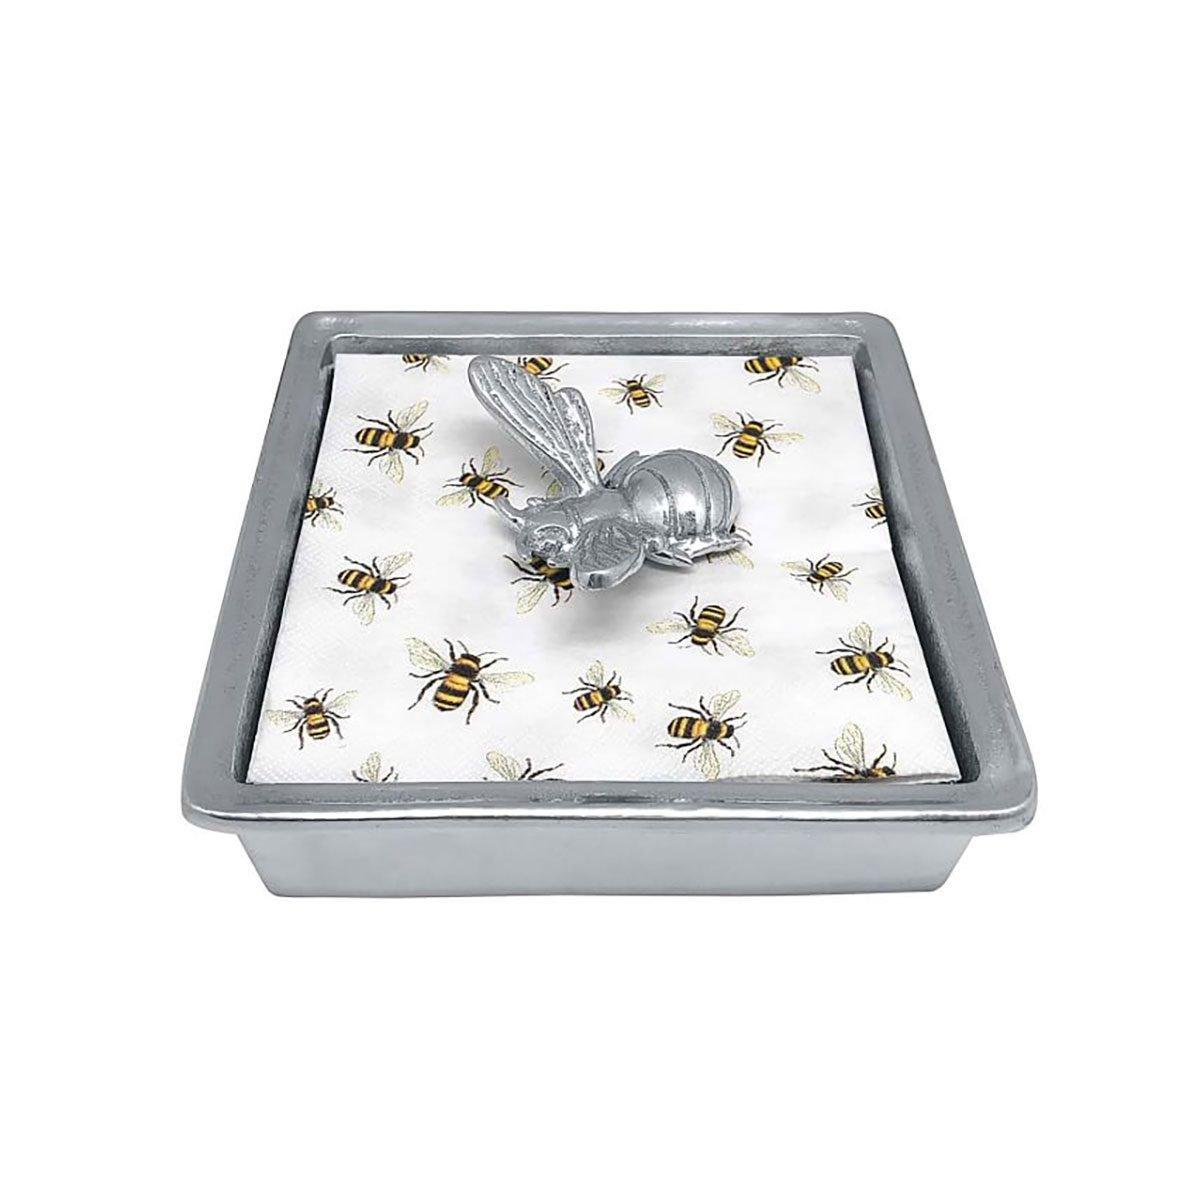 Napkin Holder Honey Bee Recycled Metal Napkin Holder With Napkins O